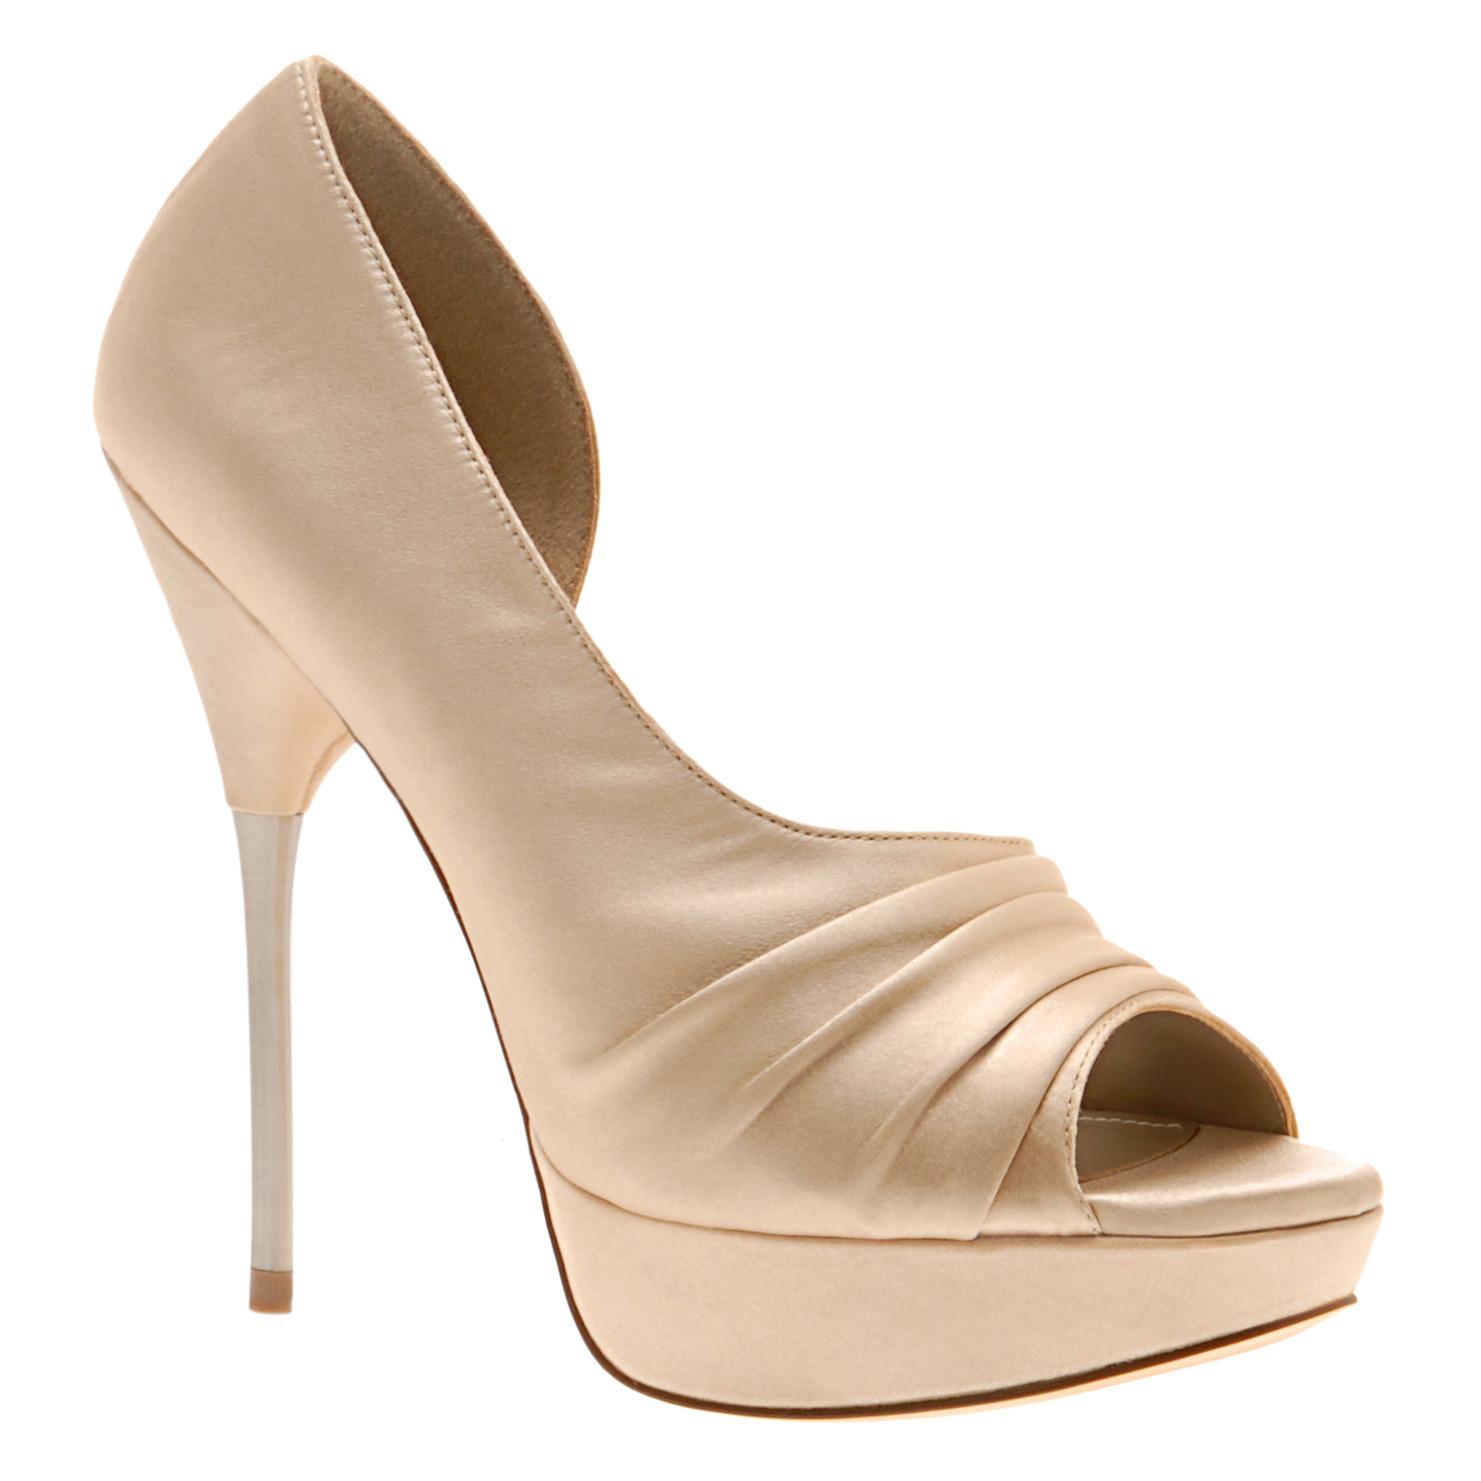 Bridal Shoes Aldo: What Shall I Wear??!!